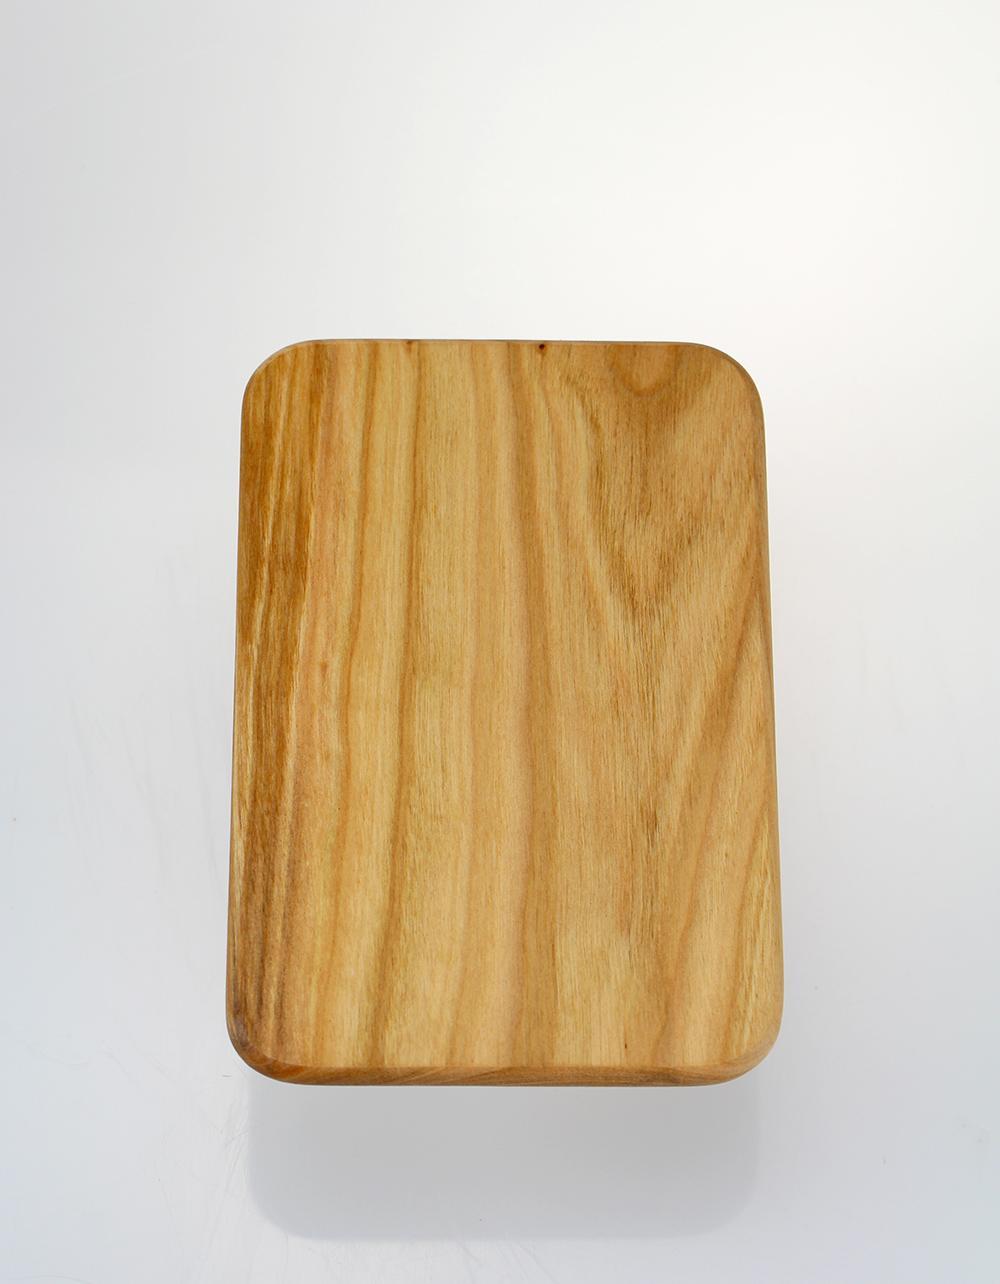 The Essential Ingredient Cherry Wood Chopping Board 18cm x 12cm x 1cm